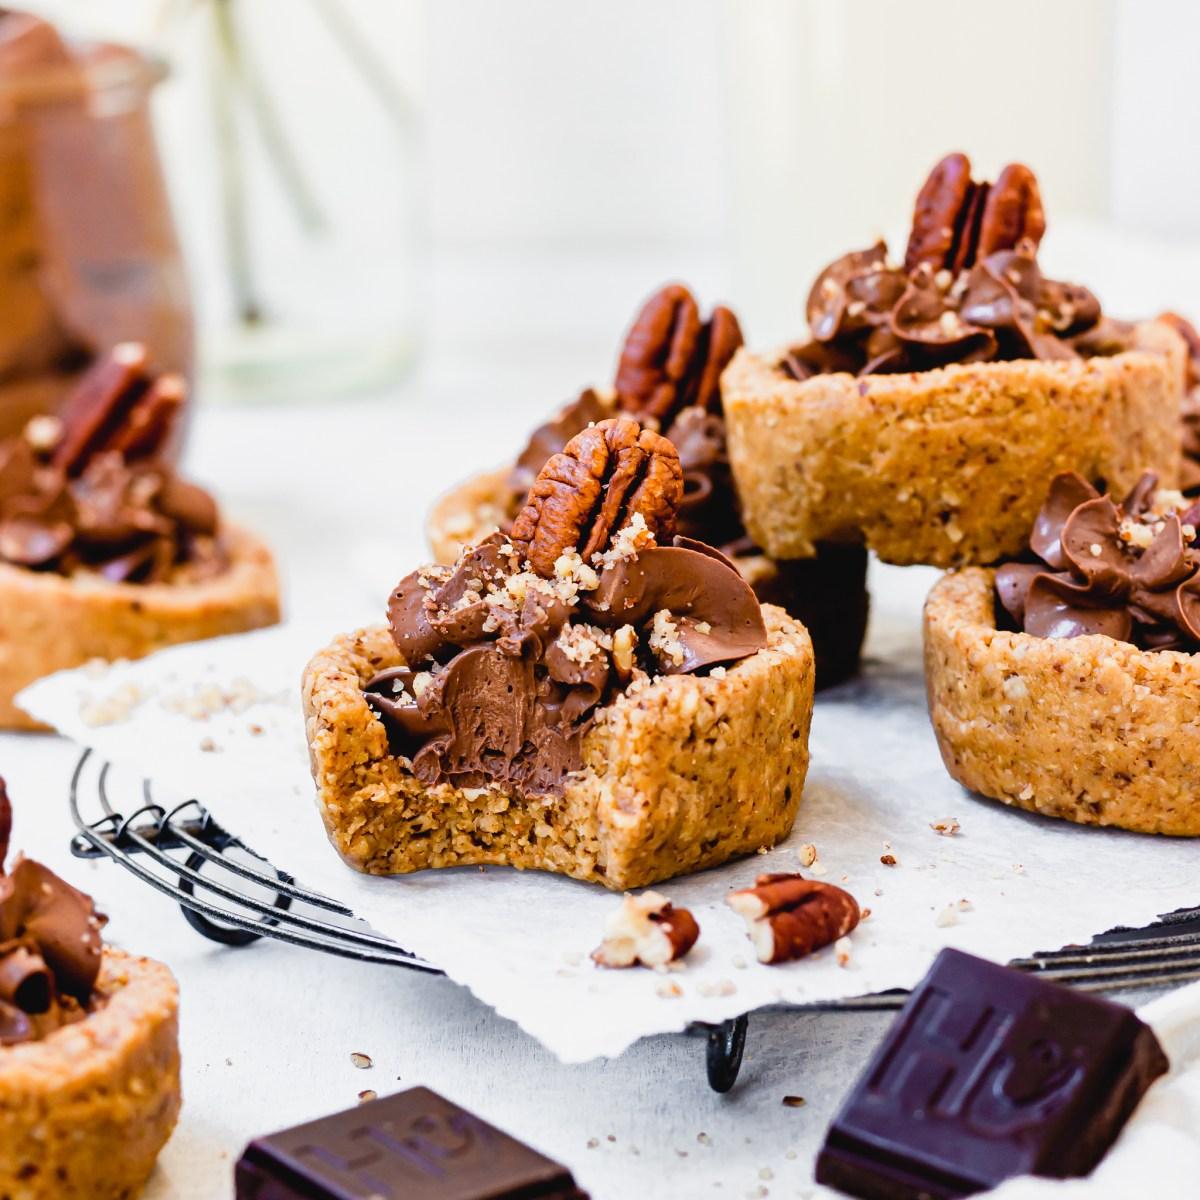 Square image of Mini Chocolate Mousse Pecan Tarts